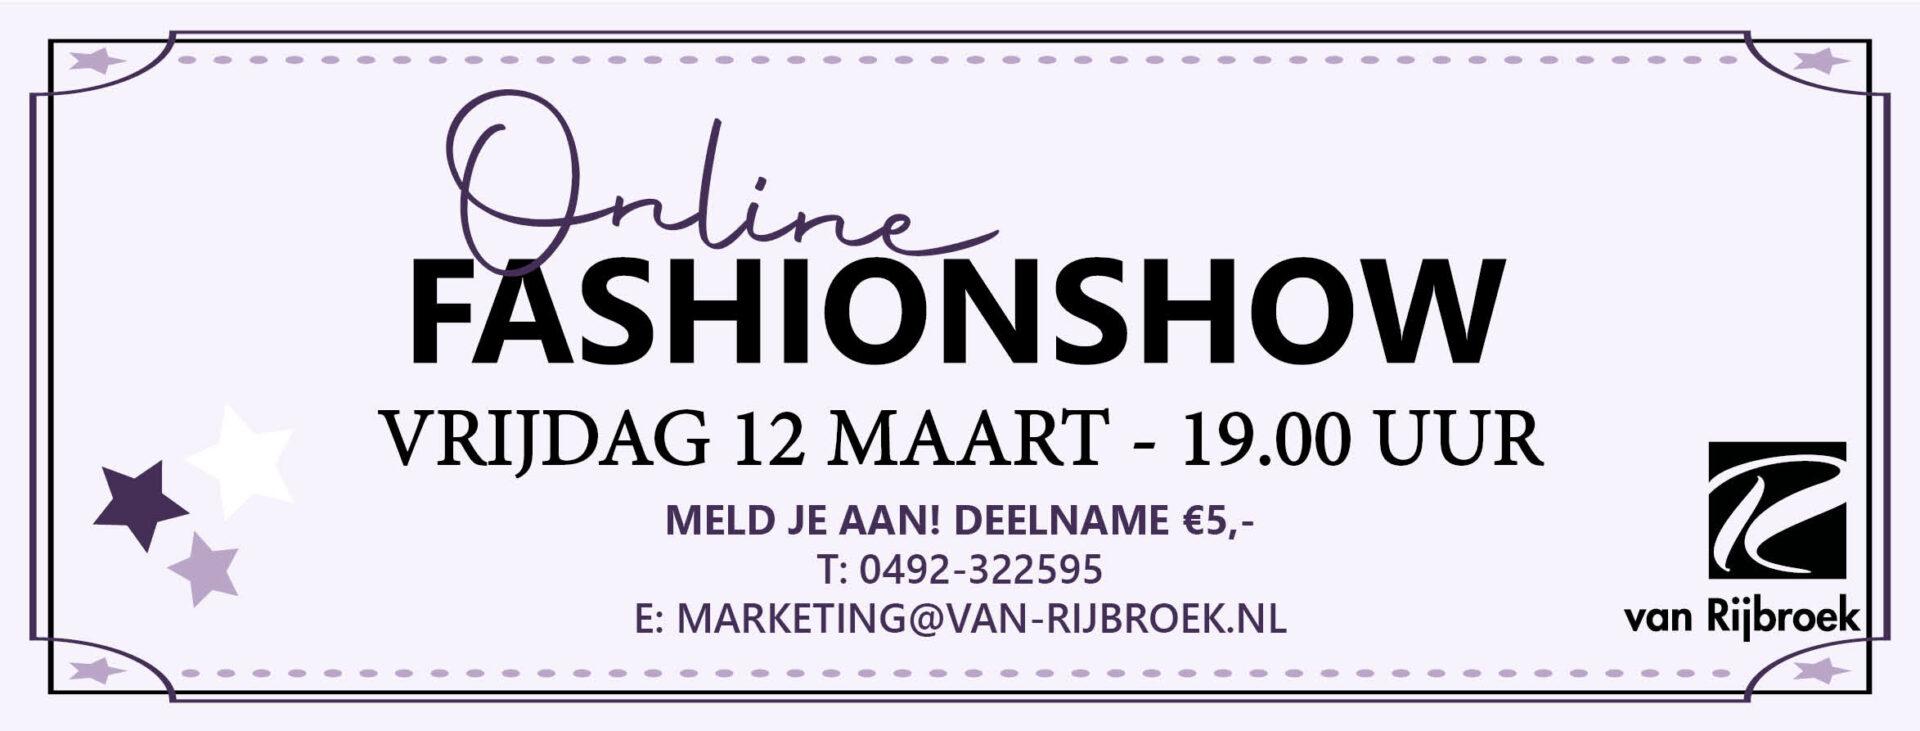 Online Fashionshow